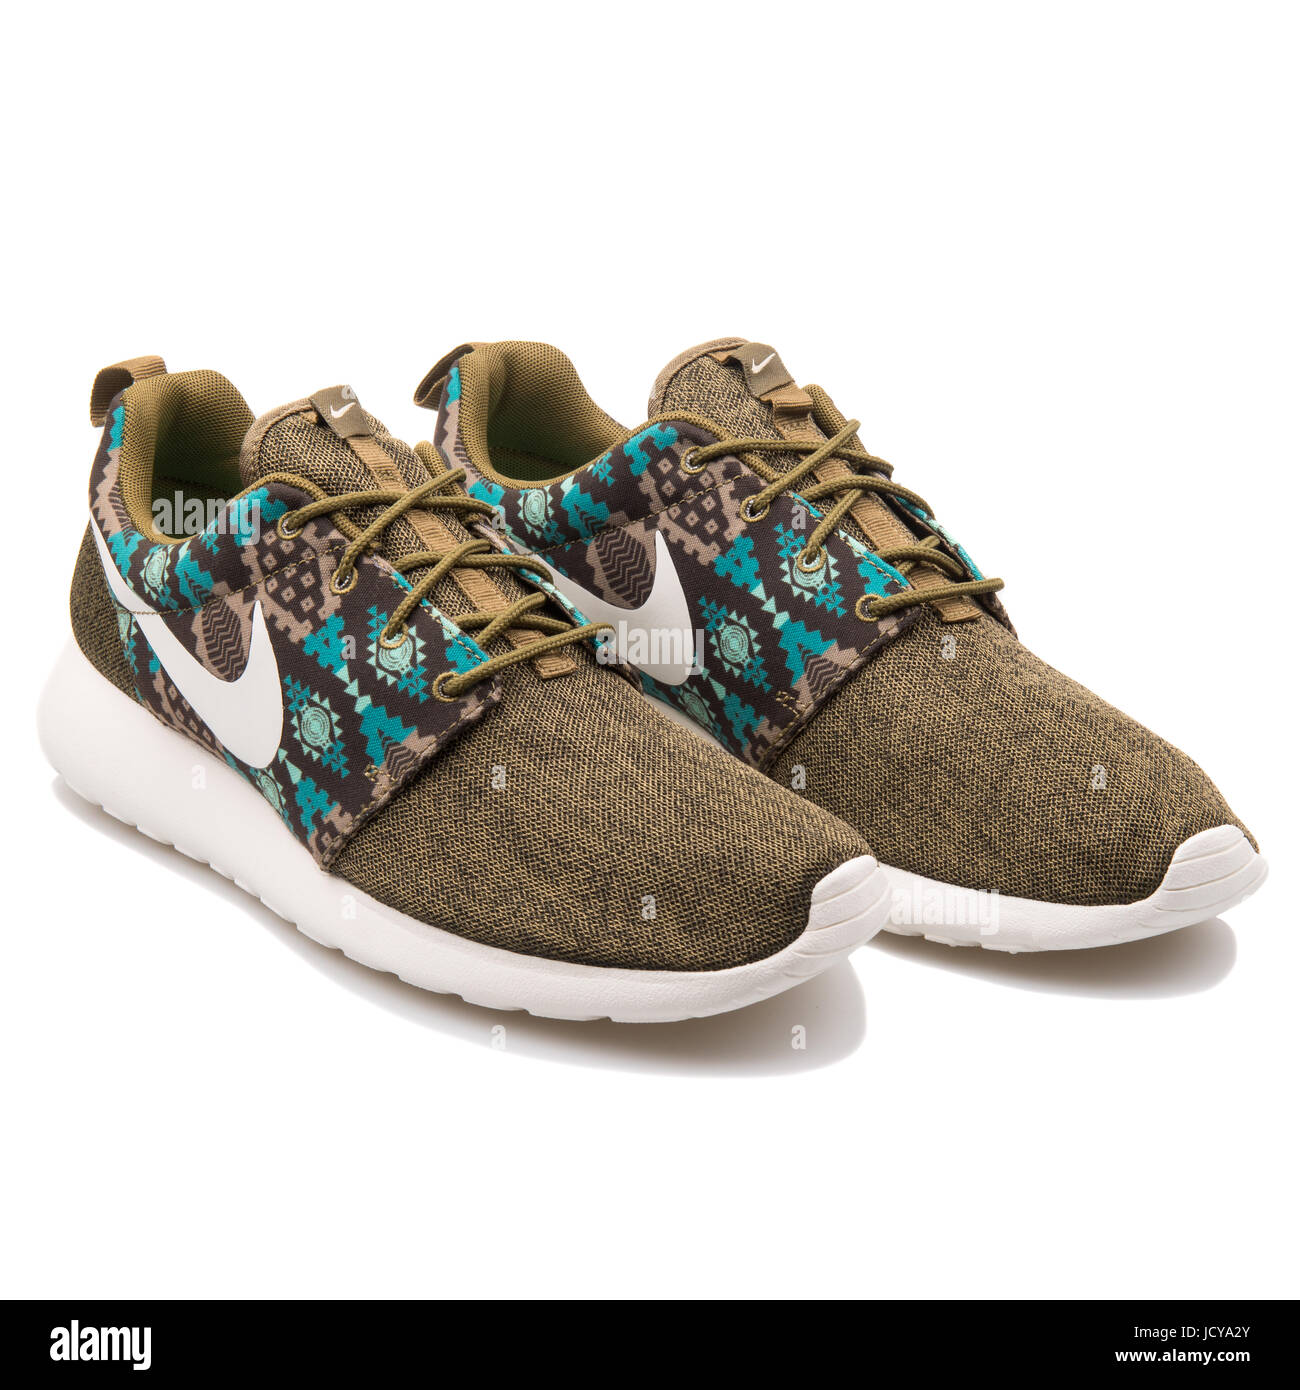 1ec3a2f2696f Nike Roshe One Print Dark Bamboo Men s Sports Shoes - 655206-213 - Stock  Image